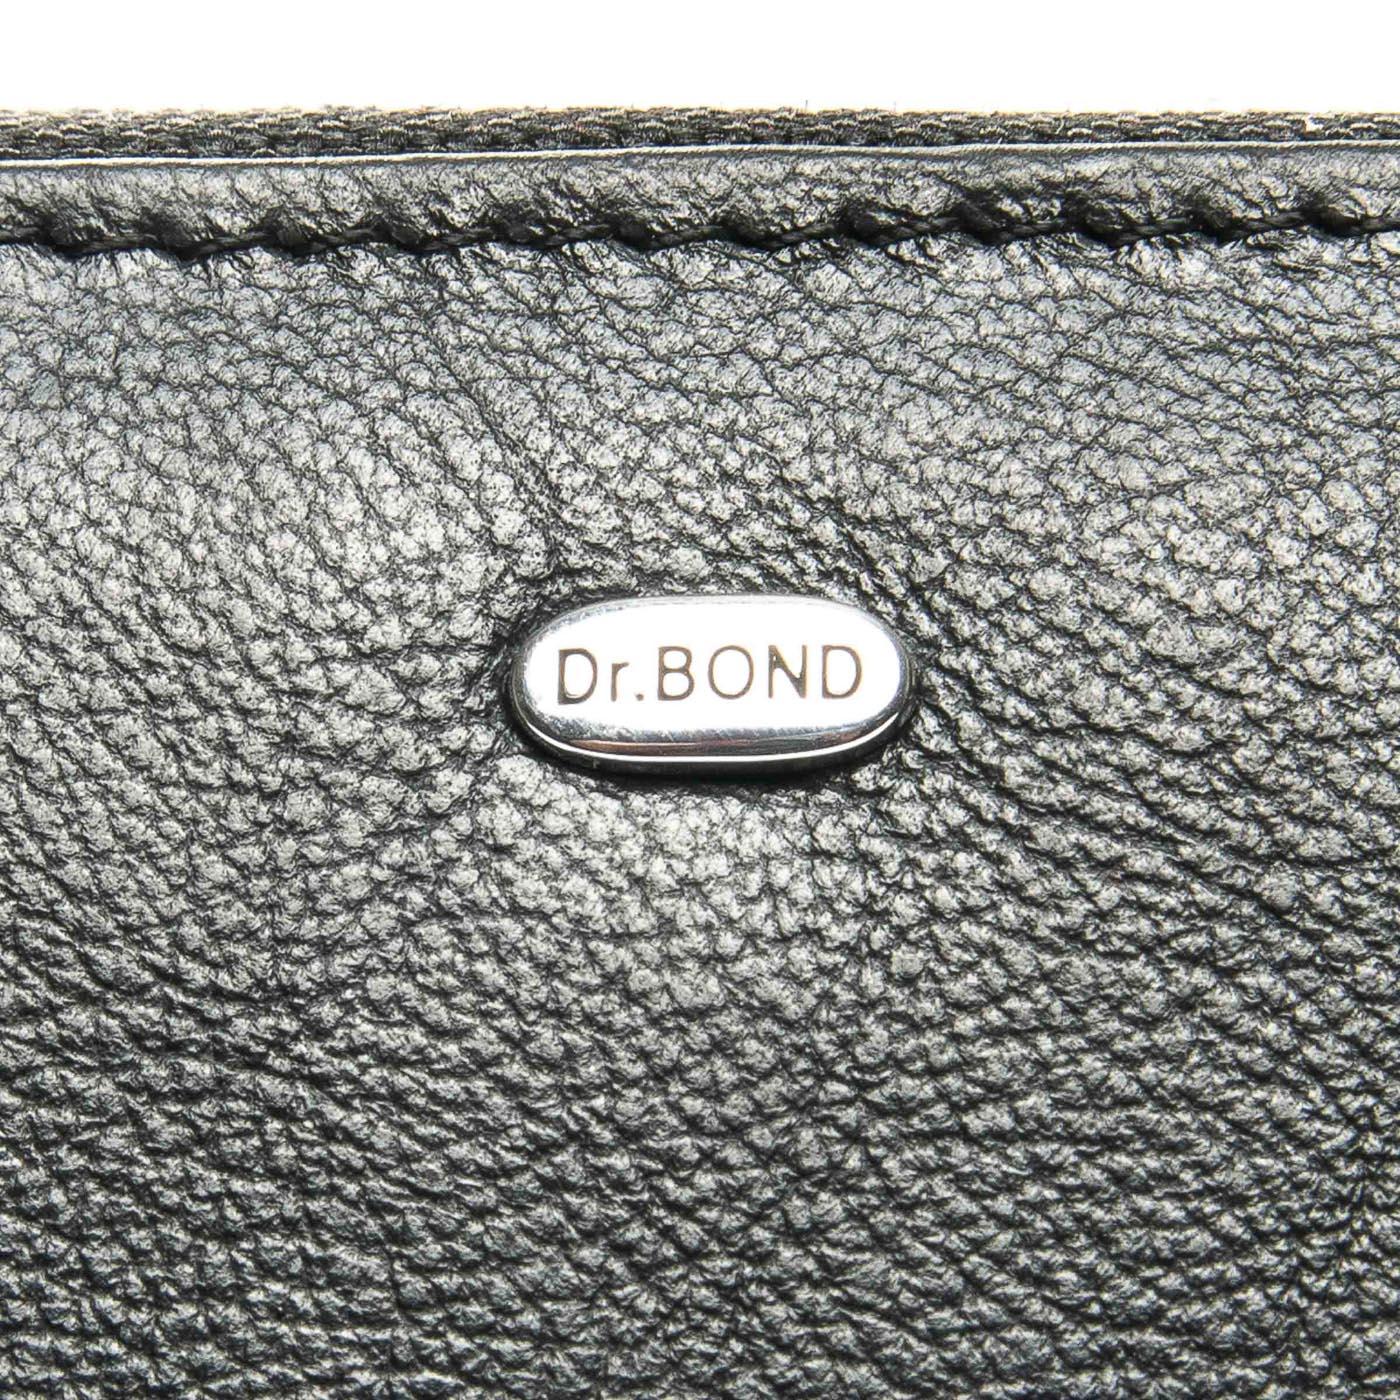 Кошелек Classic кожа DR. BOND WS-2 black цв коробка - фото 3